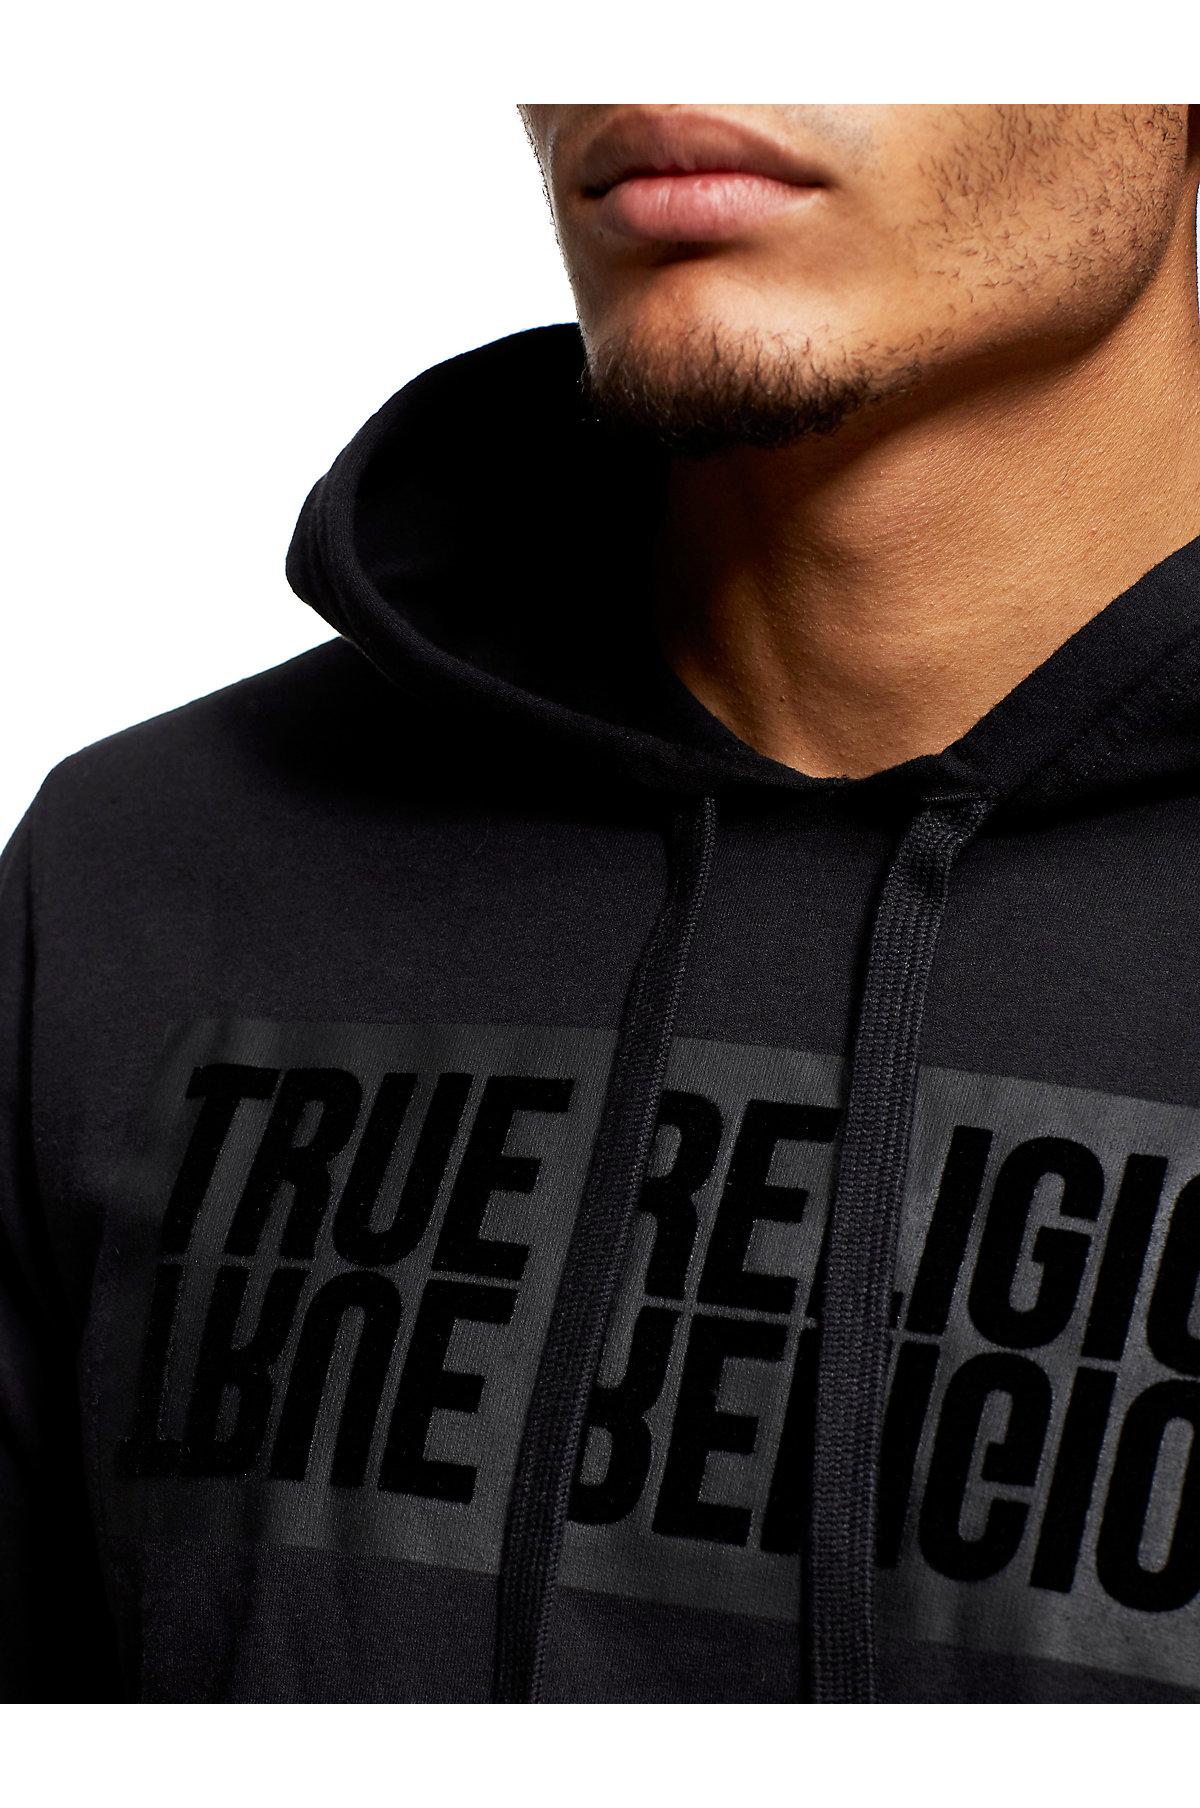 True-Religion-Men-039-s-Mirror-Logo-Reflection-Pullover-Hoodie-Sweatshirt thumbnail 11